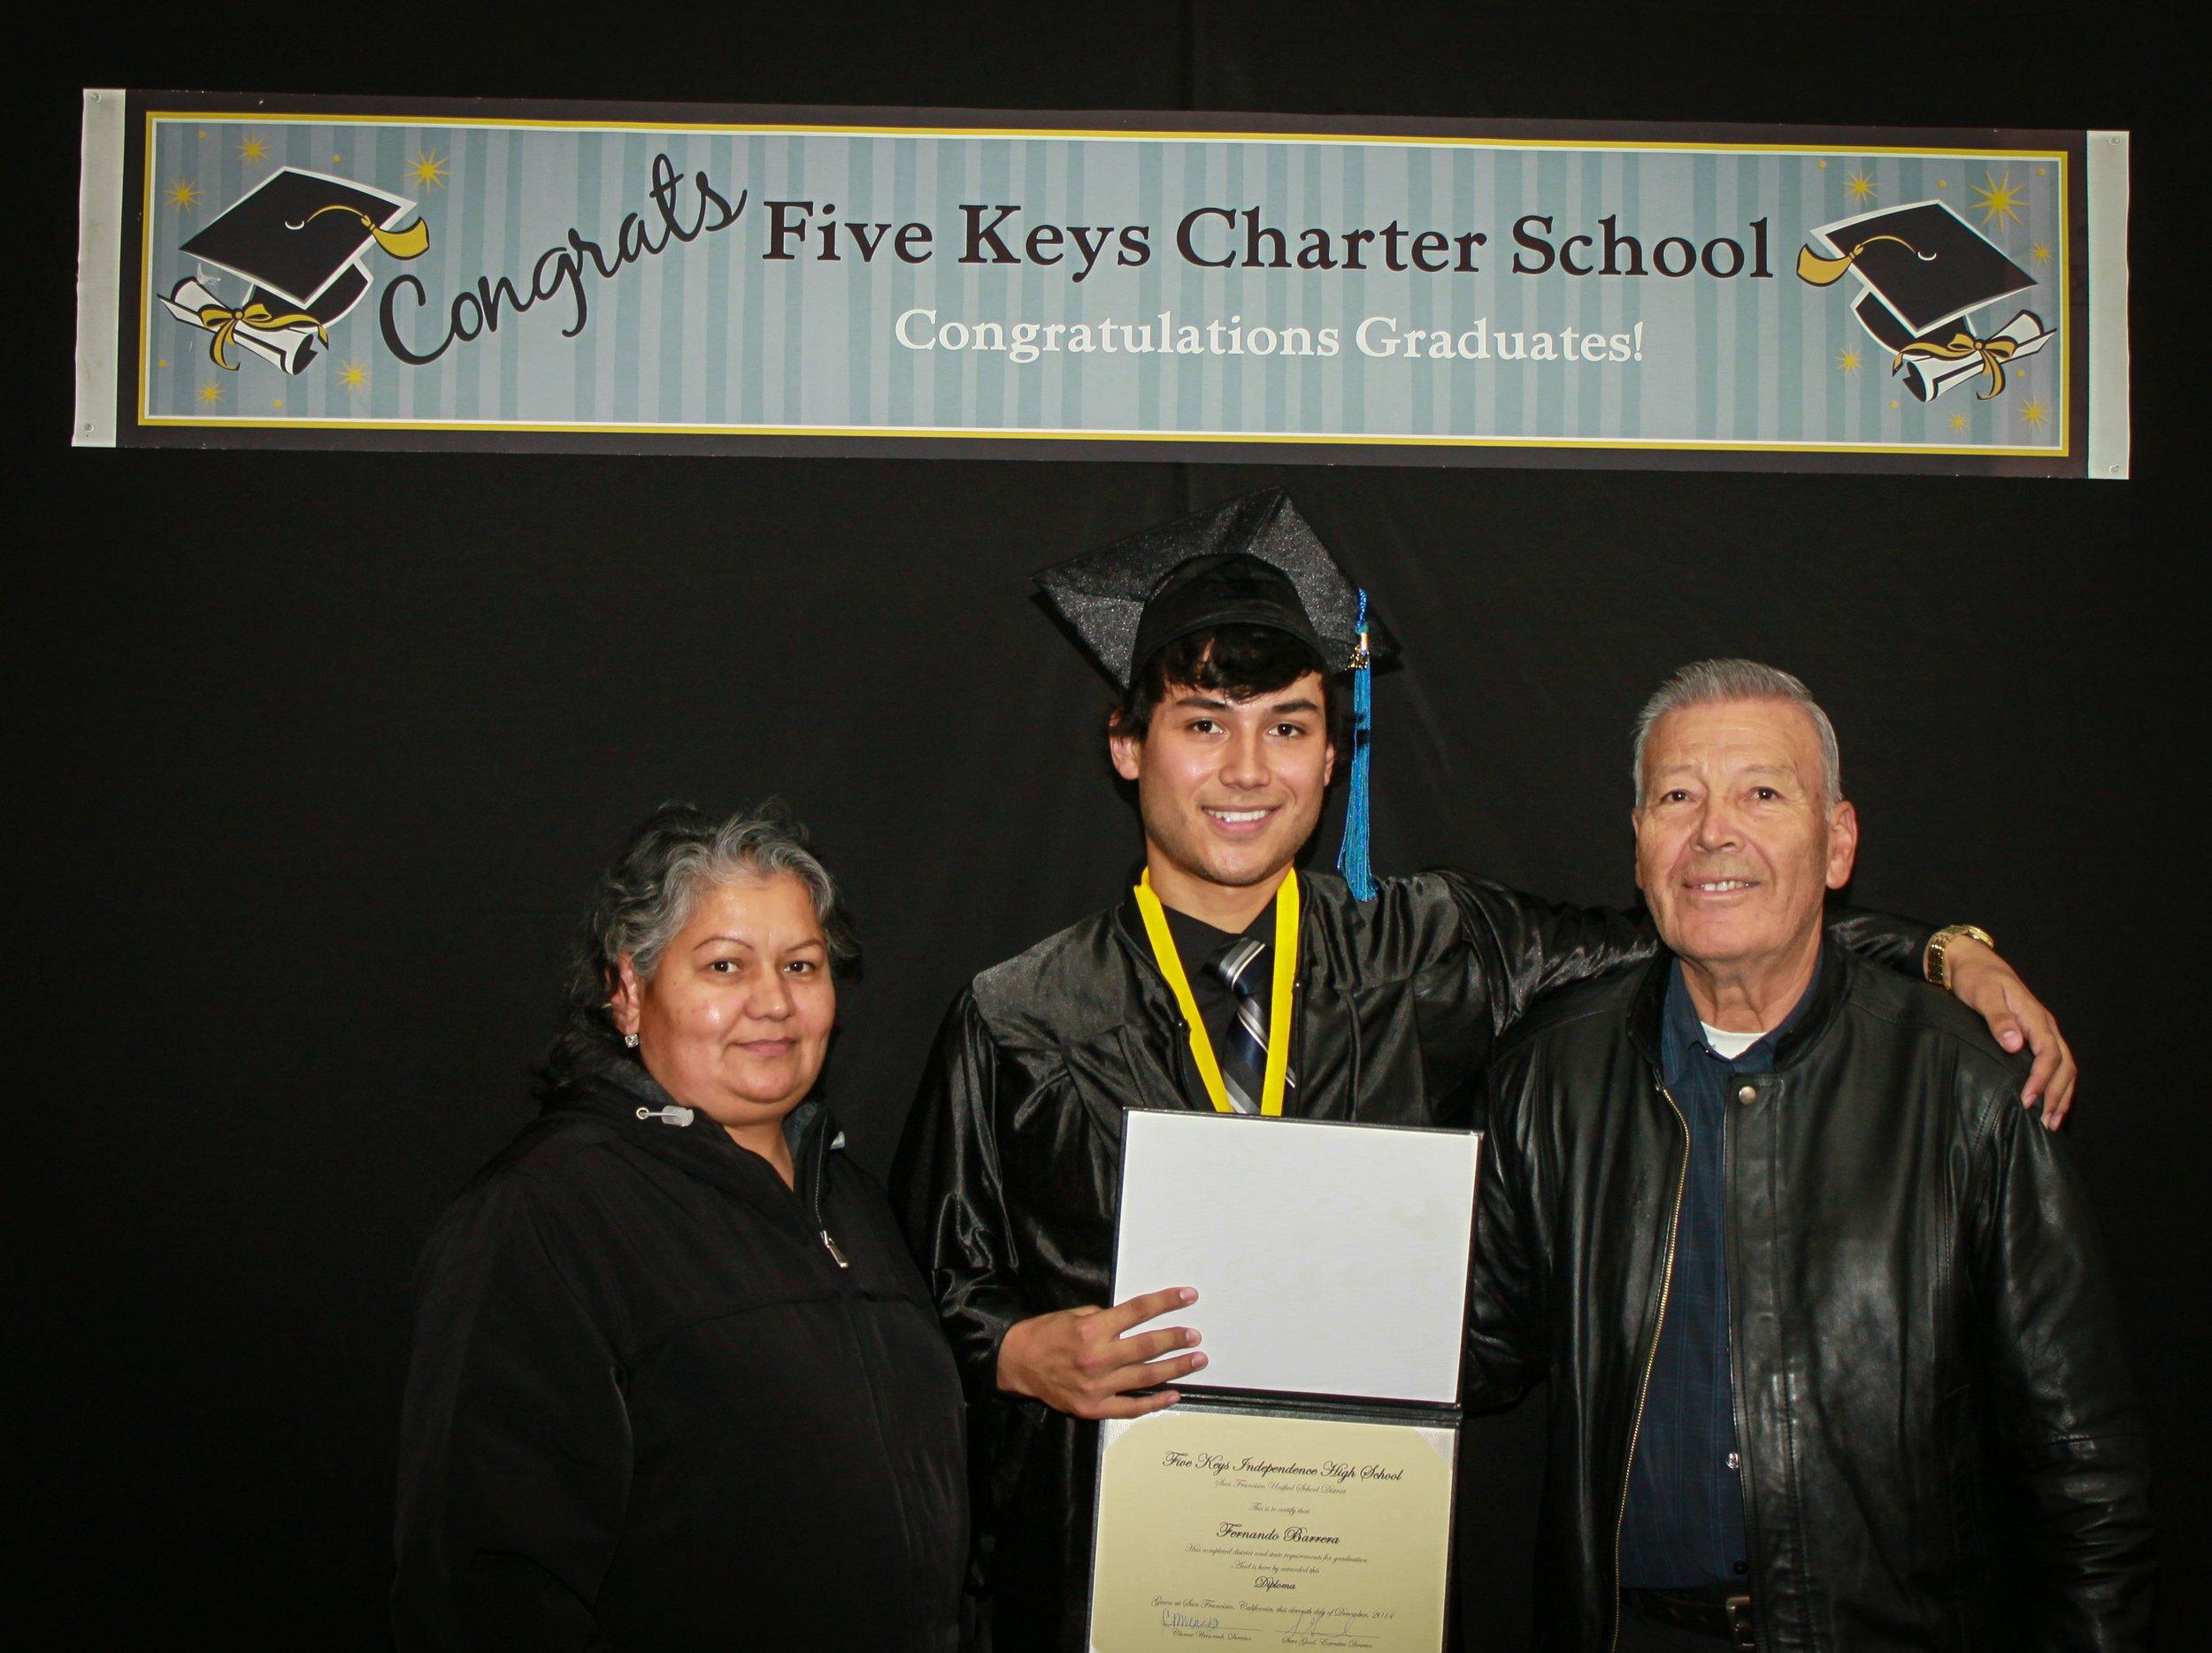 Graduate and family (6).jpg